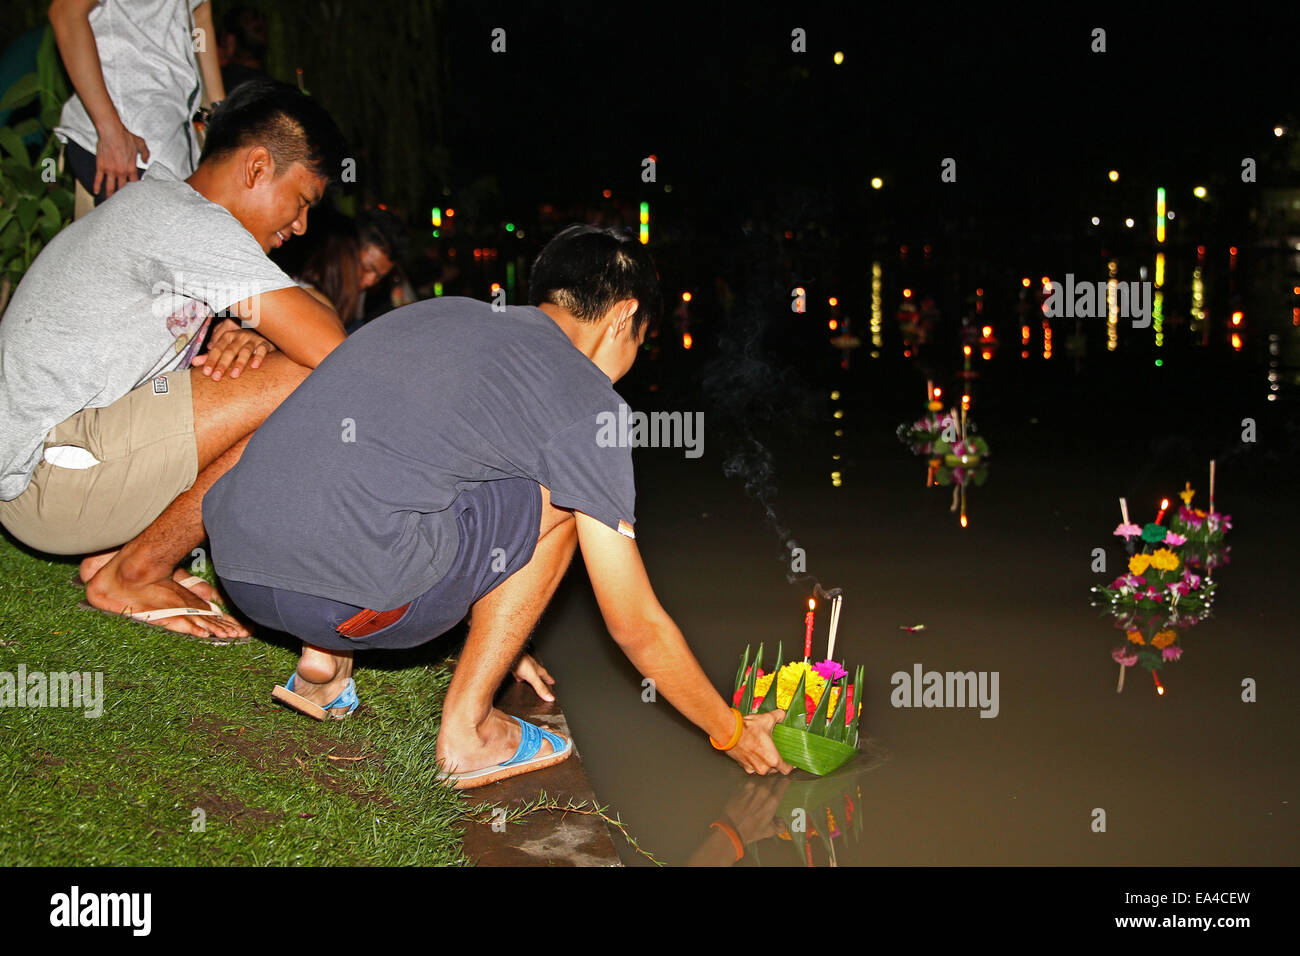 Chatuchak Park's lake, Bangkok, Thailand. 6th November 2014. A young man places his krathong (small vessel) in the Stock Photo